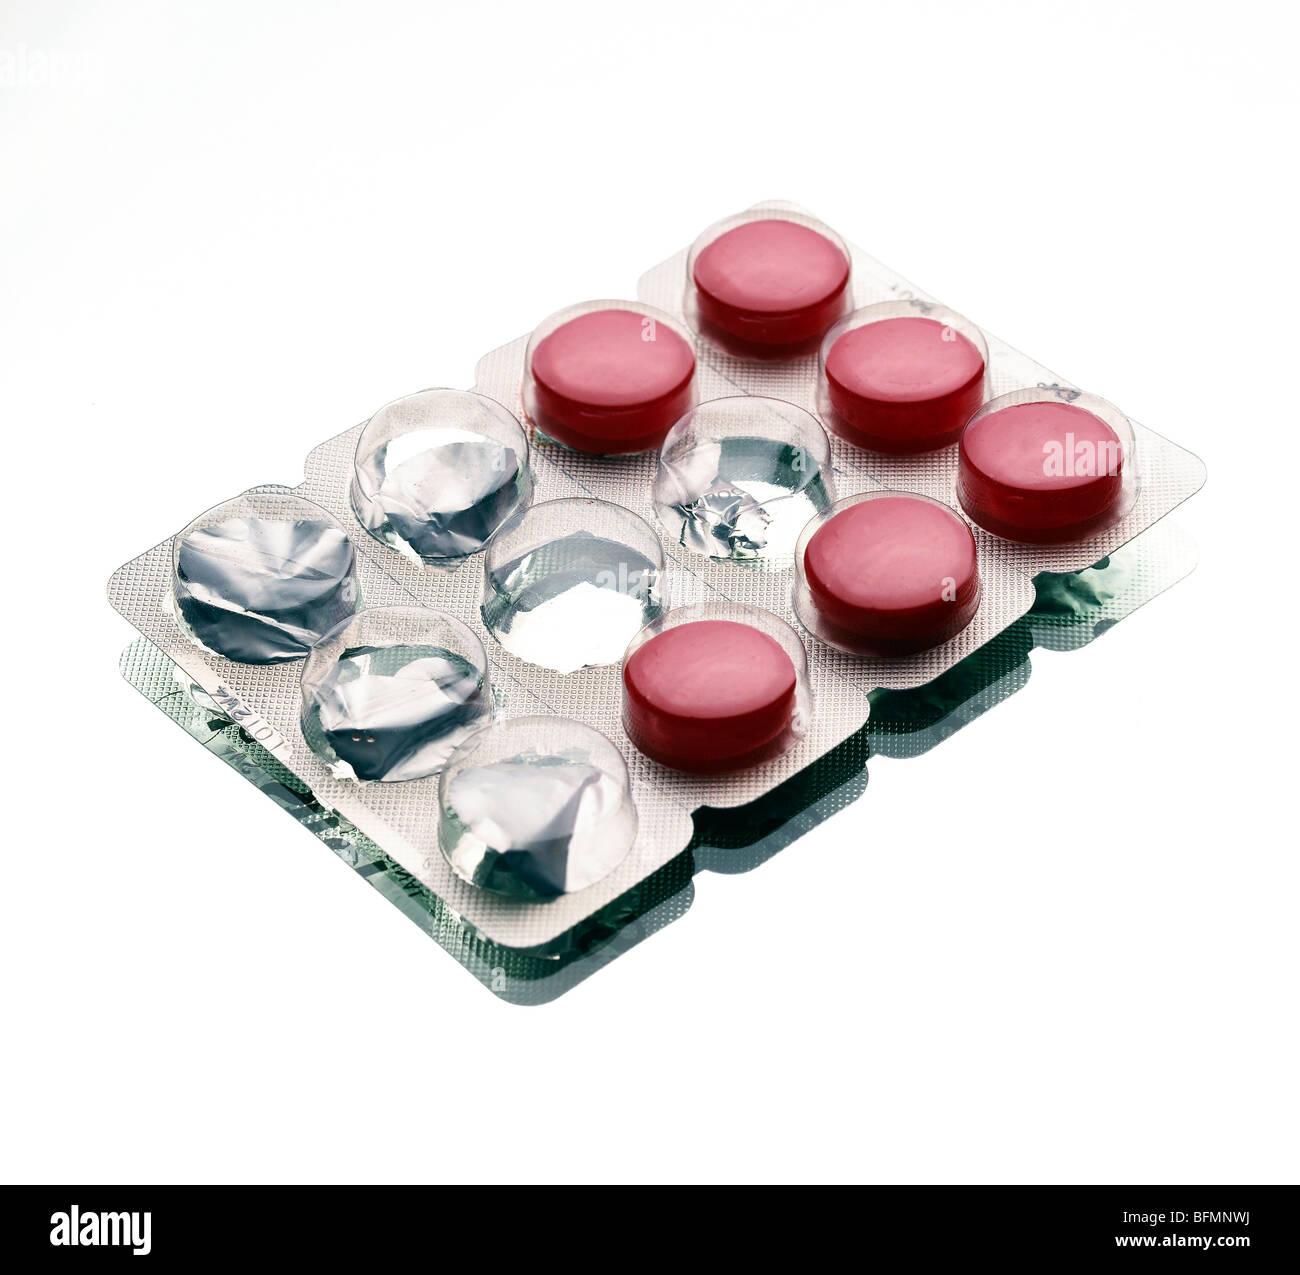 Throat lozenges - Stock Image